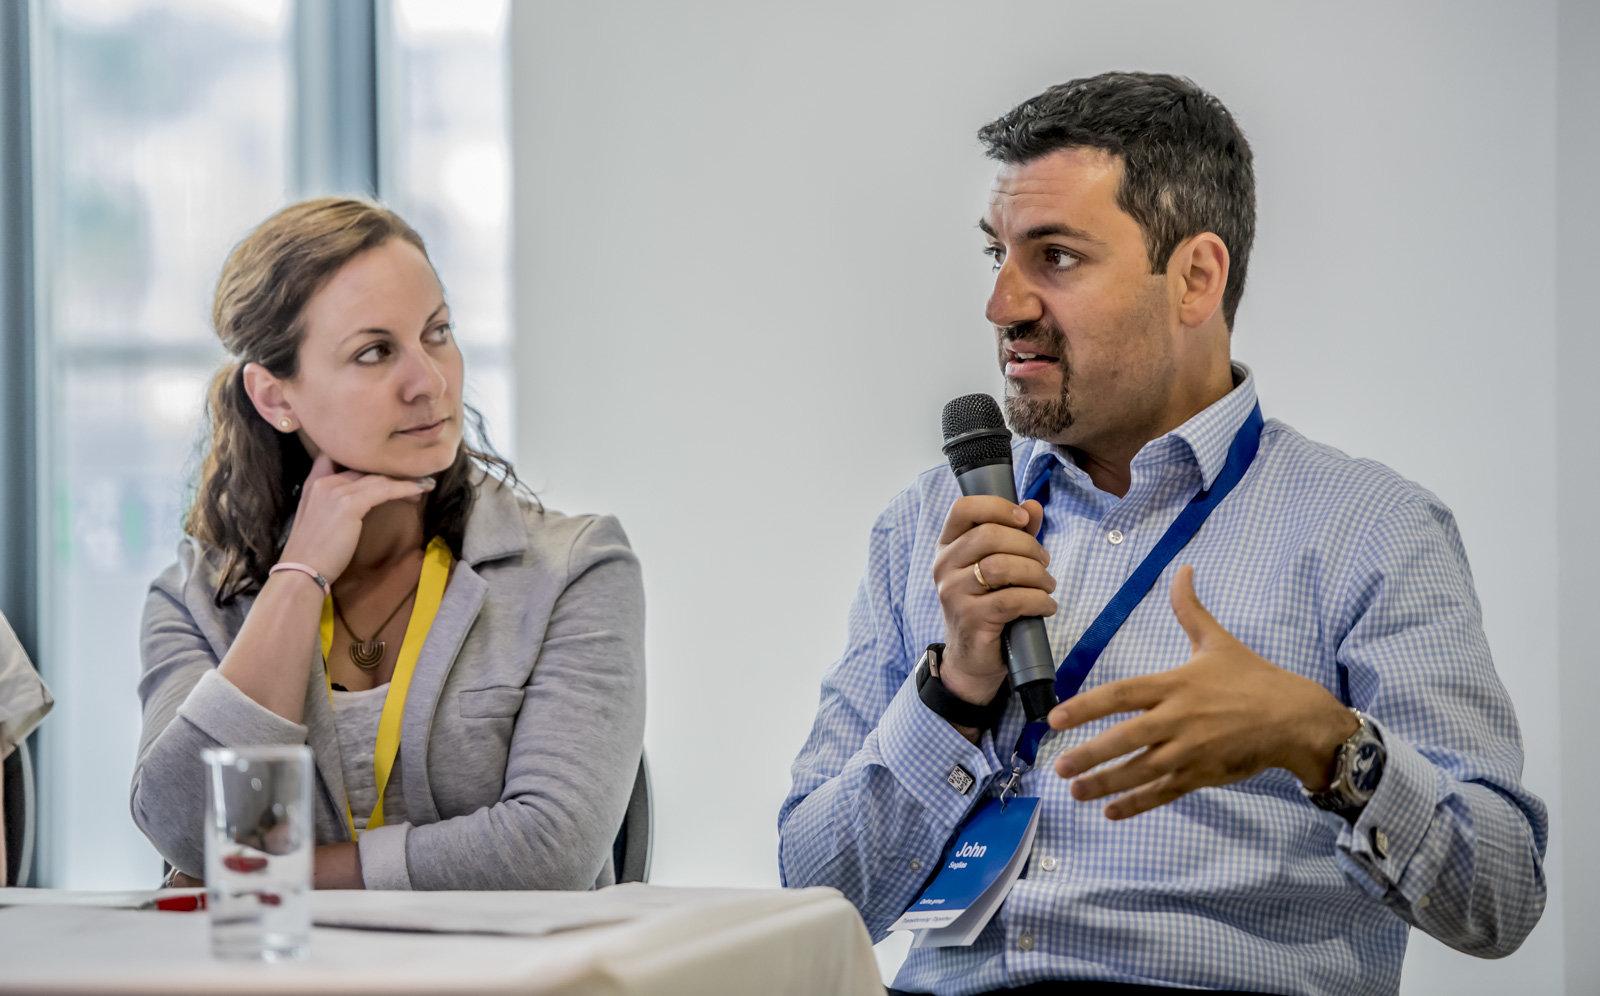 DEFRA Panel discussion